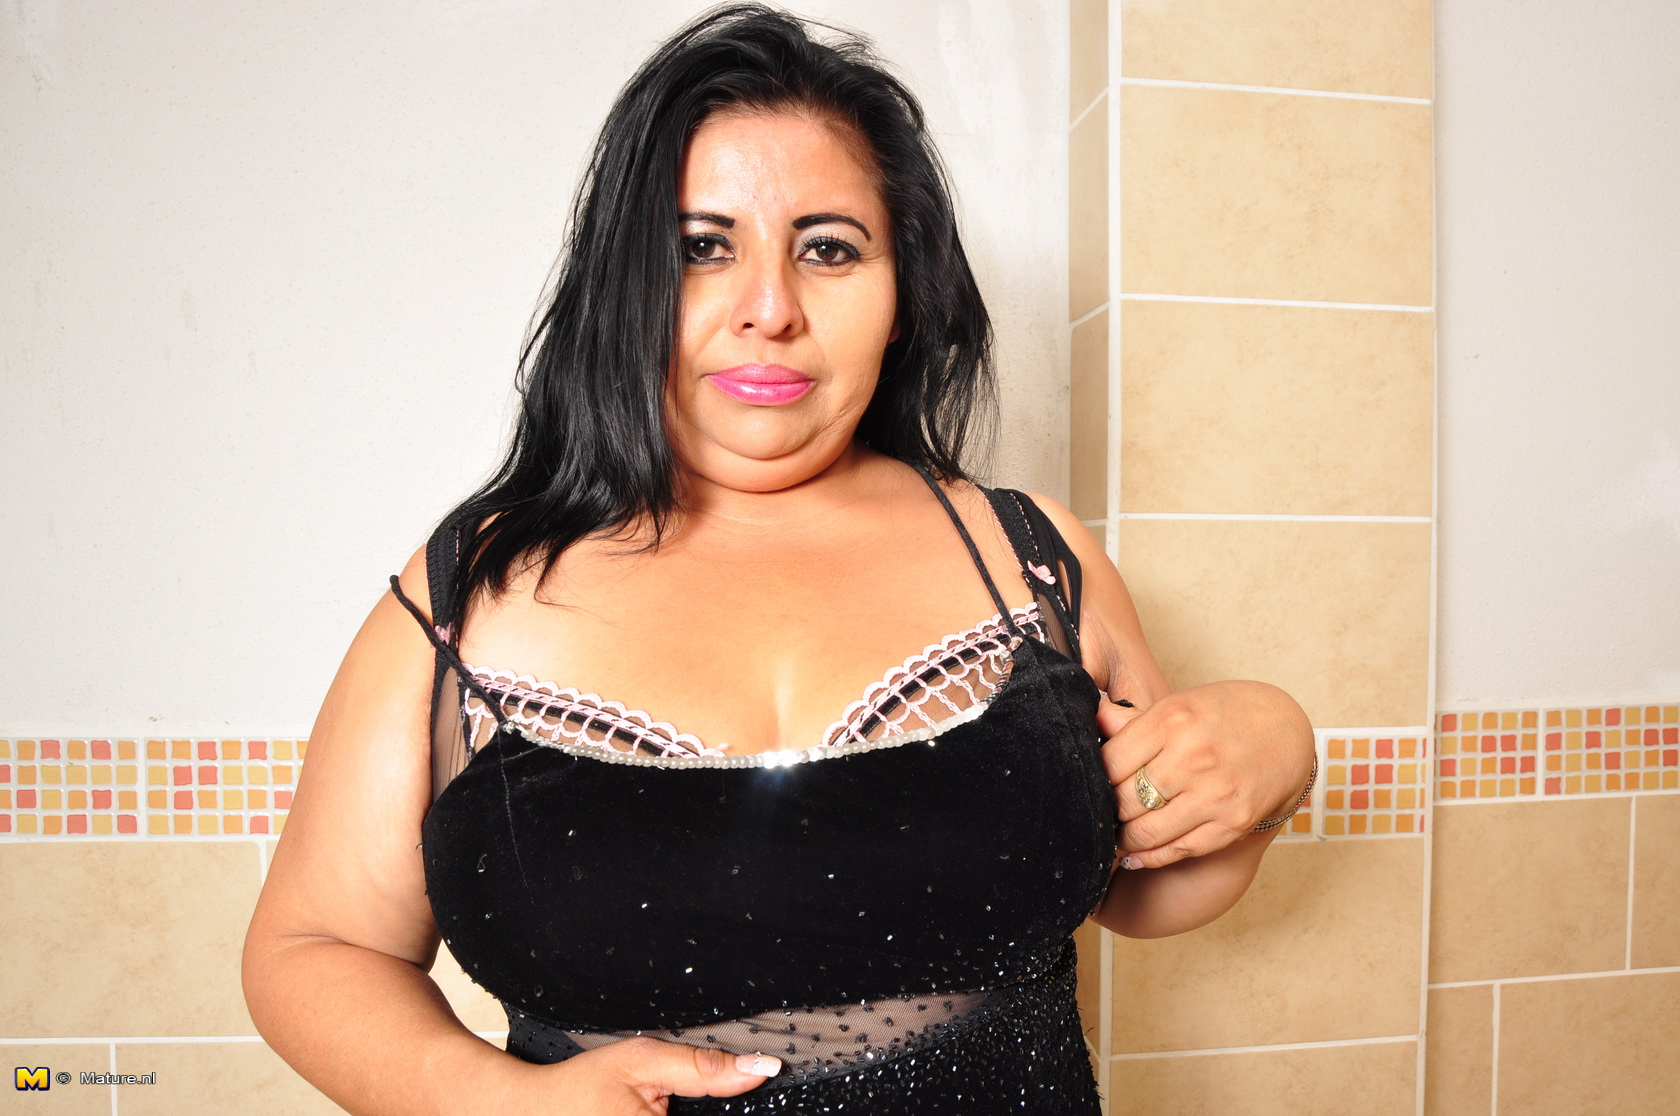 Nude pics of latina big mamas, black tean pussy